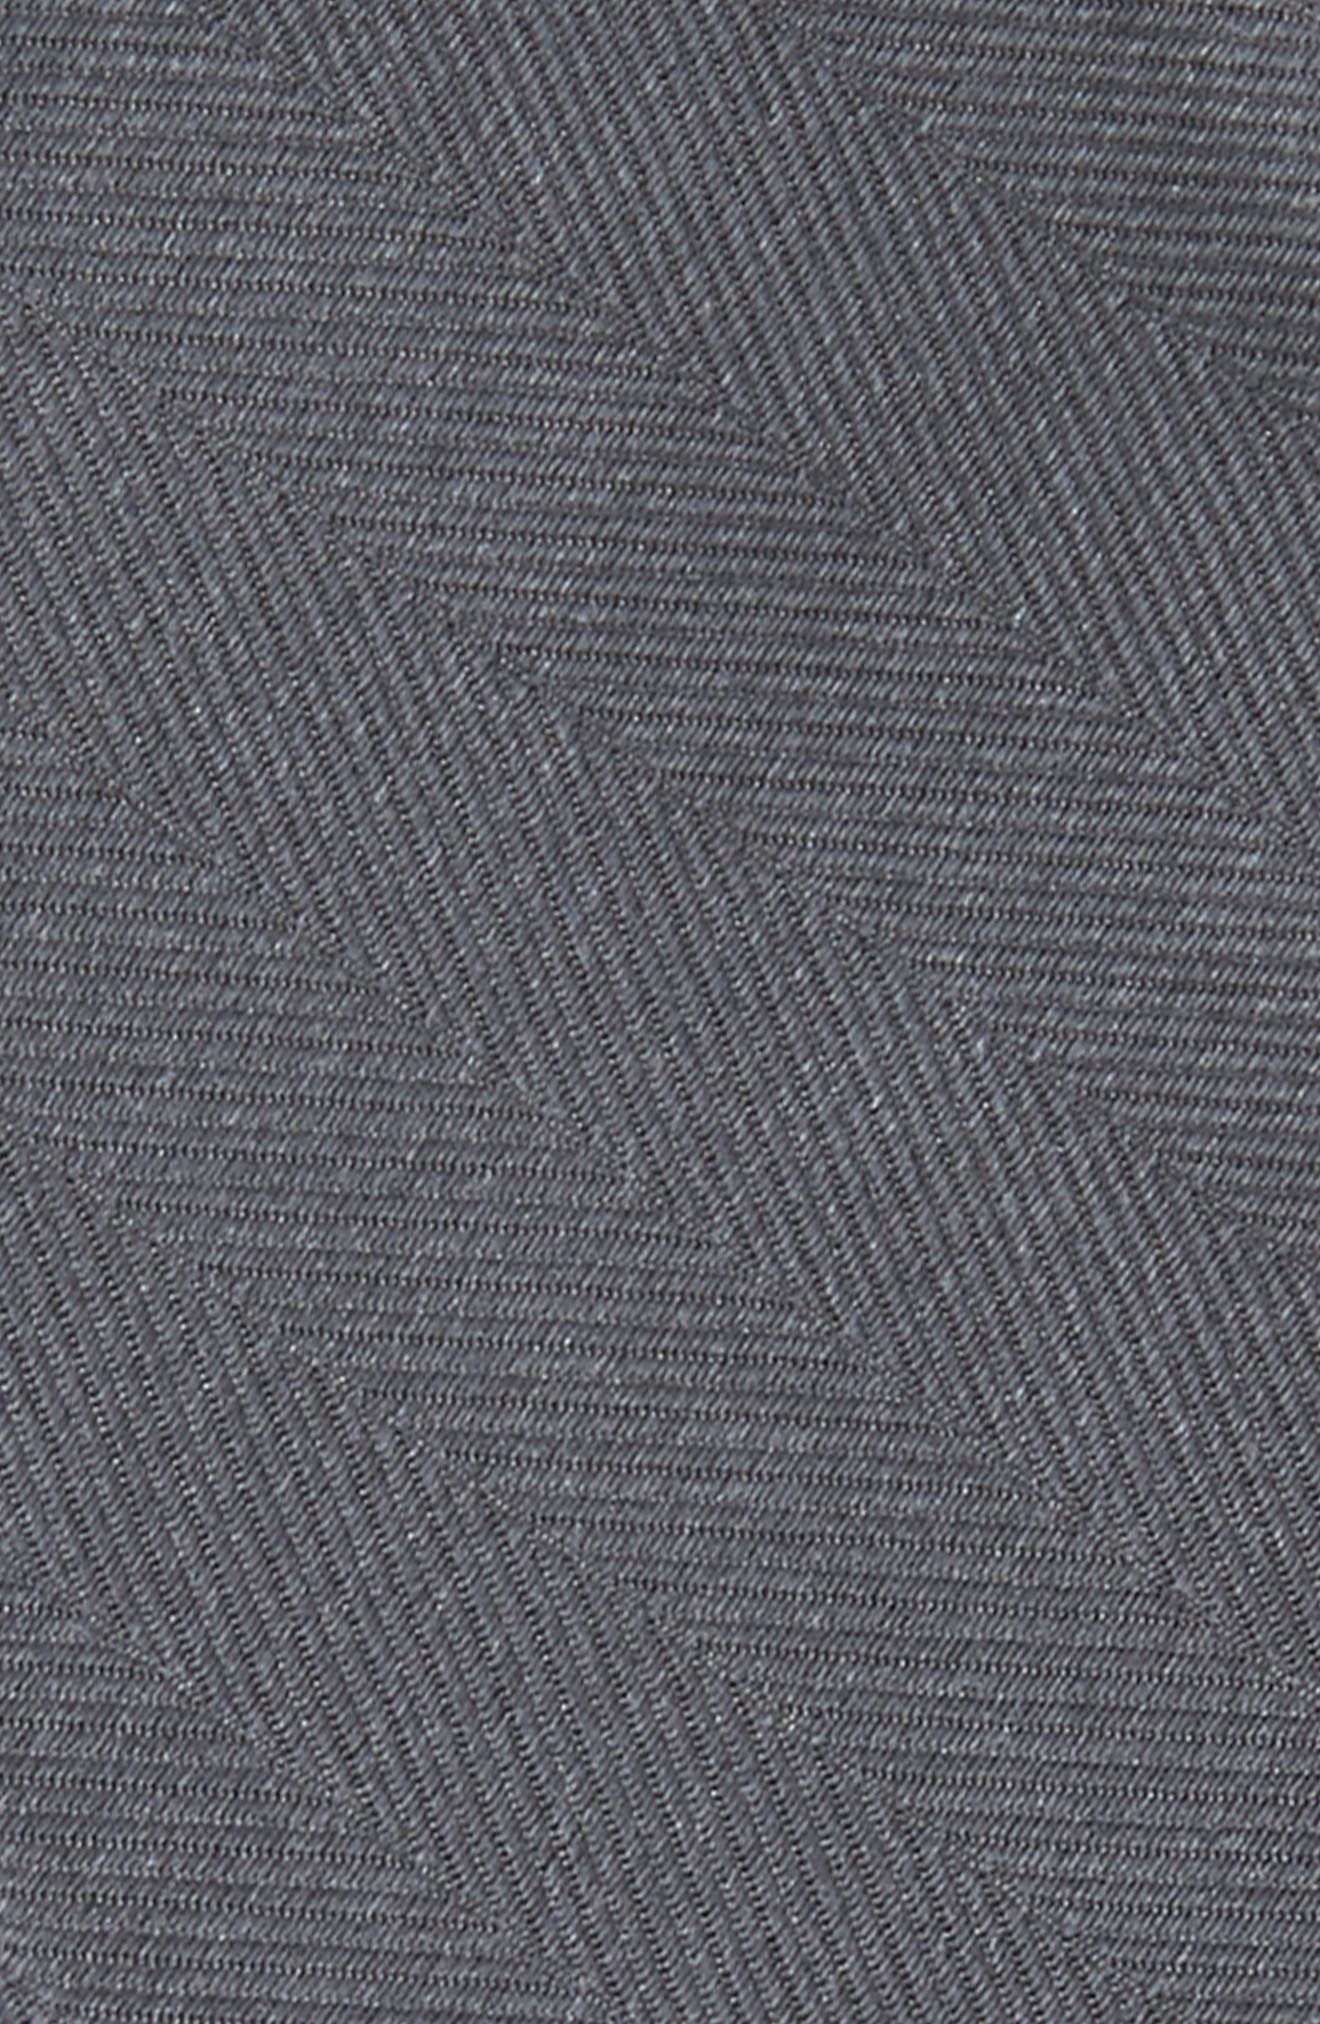 Herringbone Silk Bow Tie,                             Alternate thumbnail 3, color,                             020